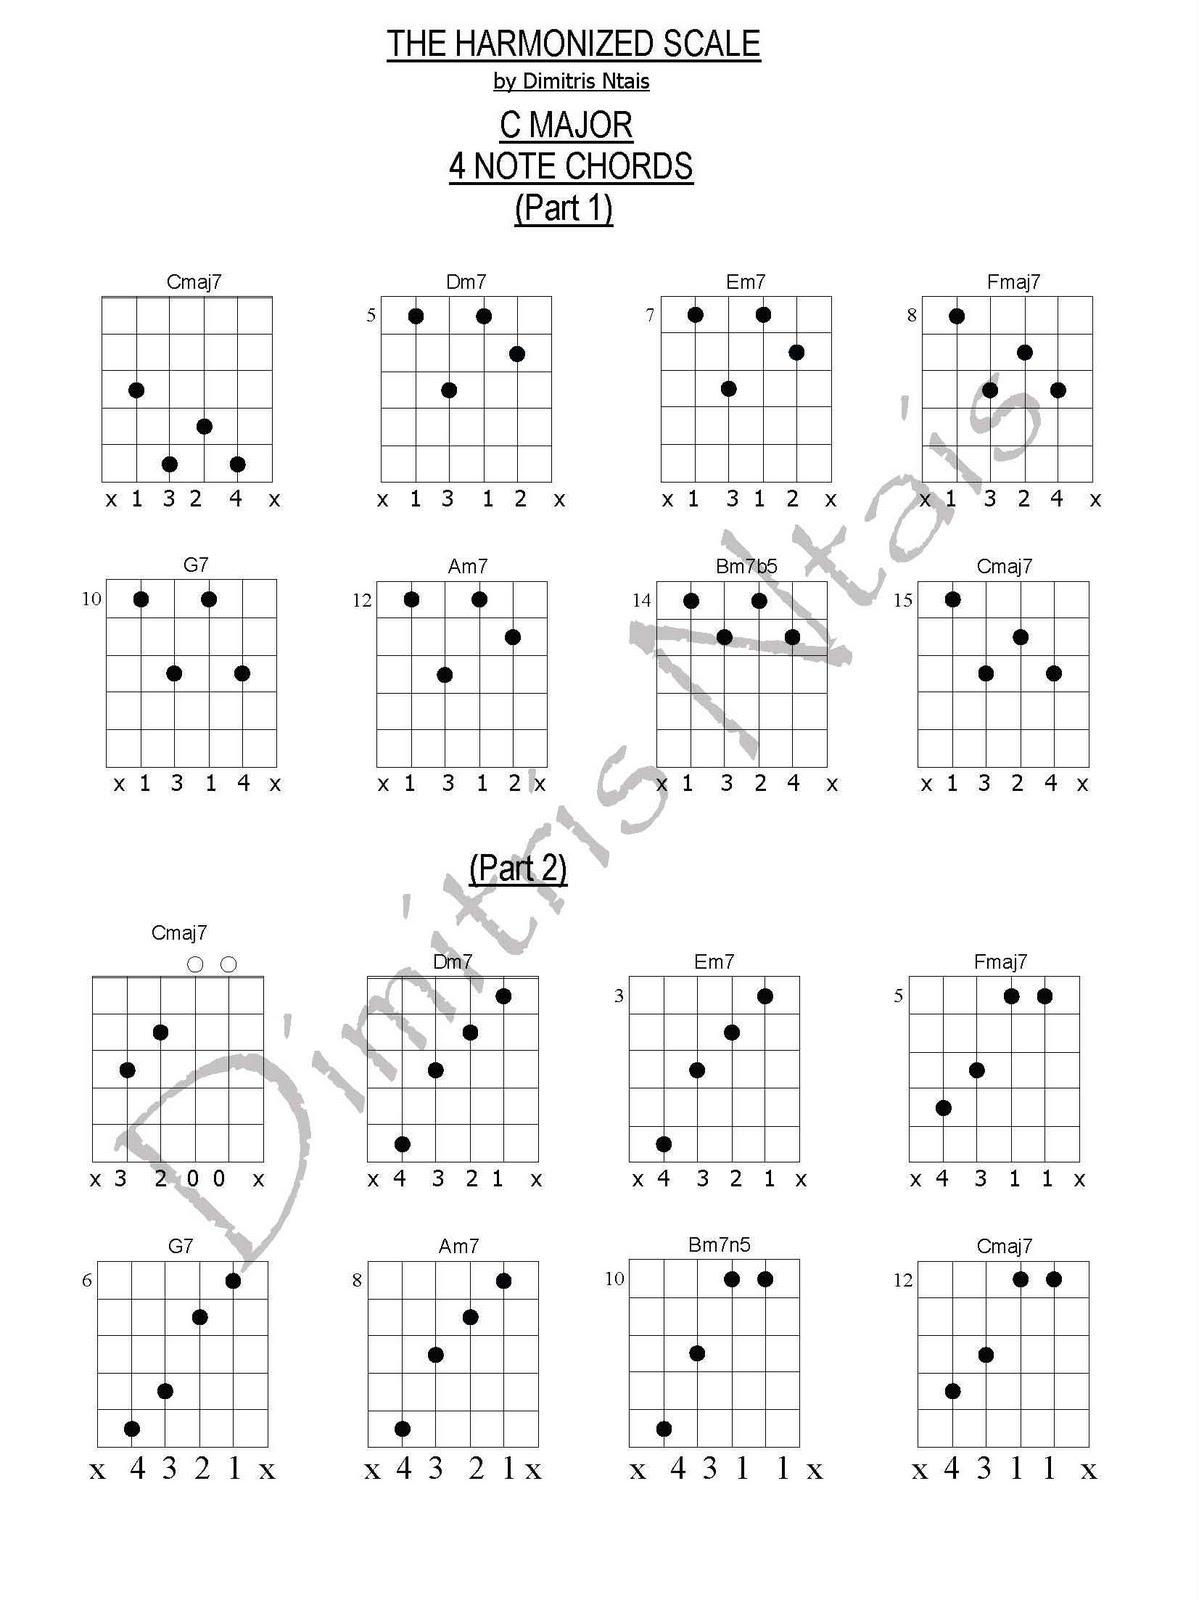 Dimitris Ntais Guitar The Harmonized Scale 4 Note Chords Applied